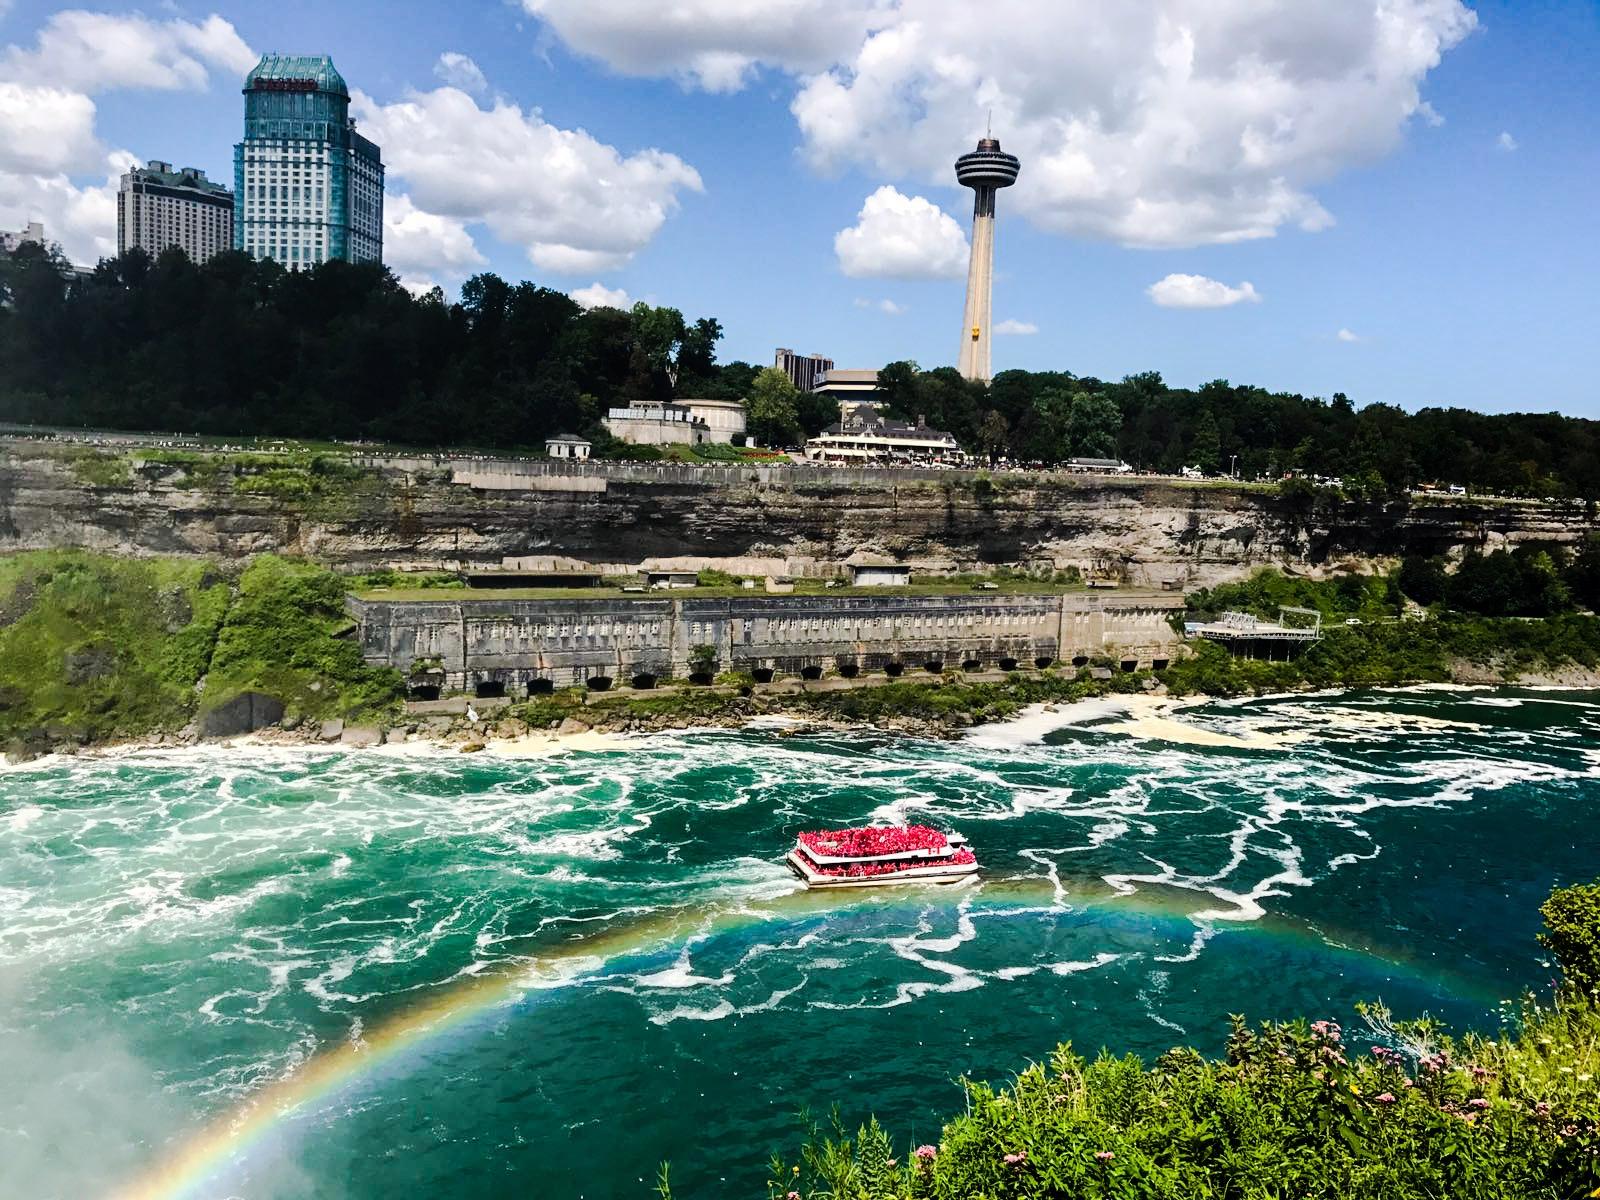 Rainbow over Niagara river by Sneha Ghosh